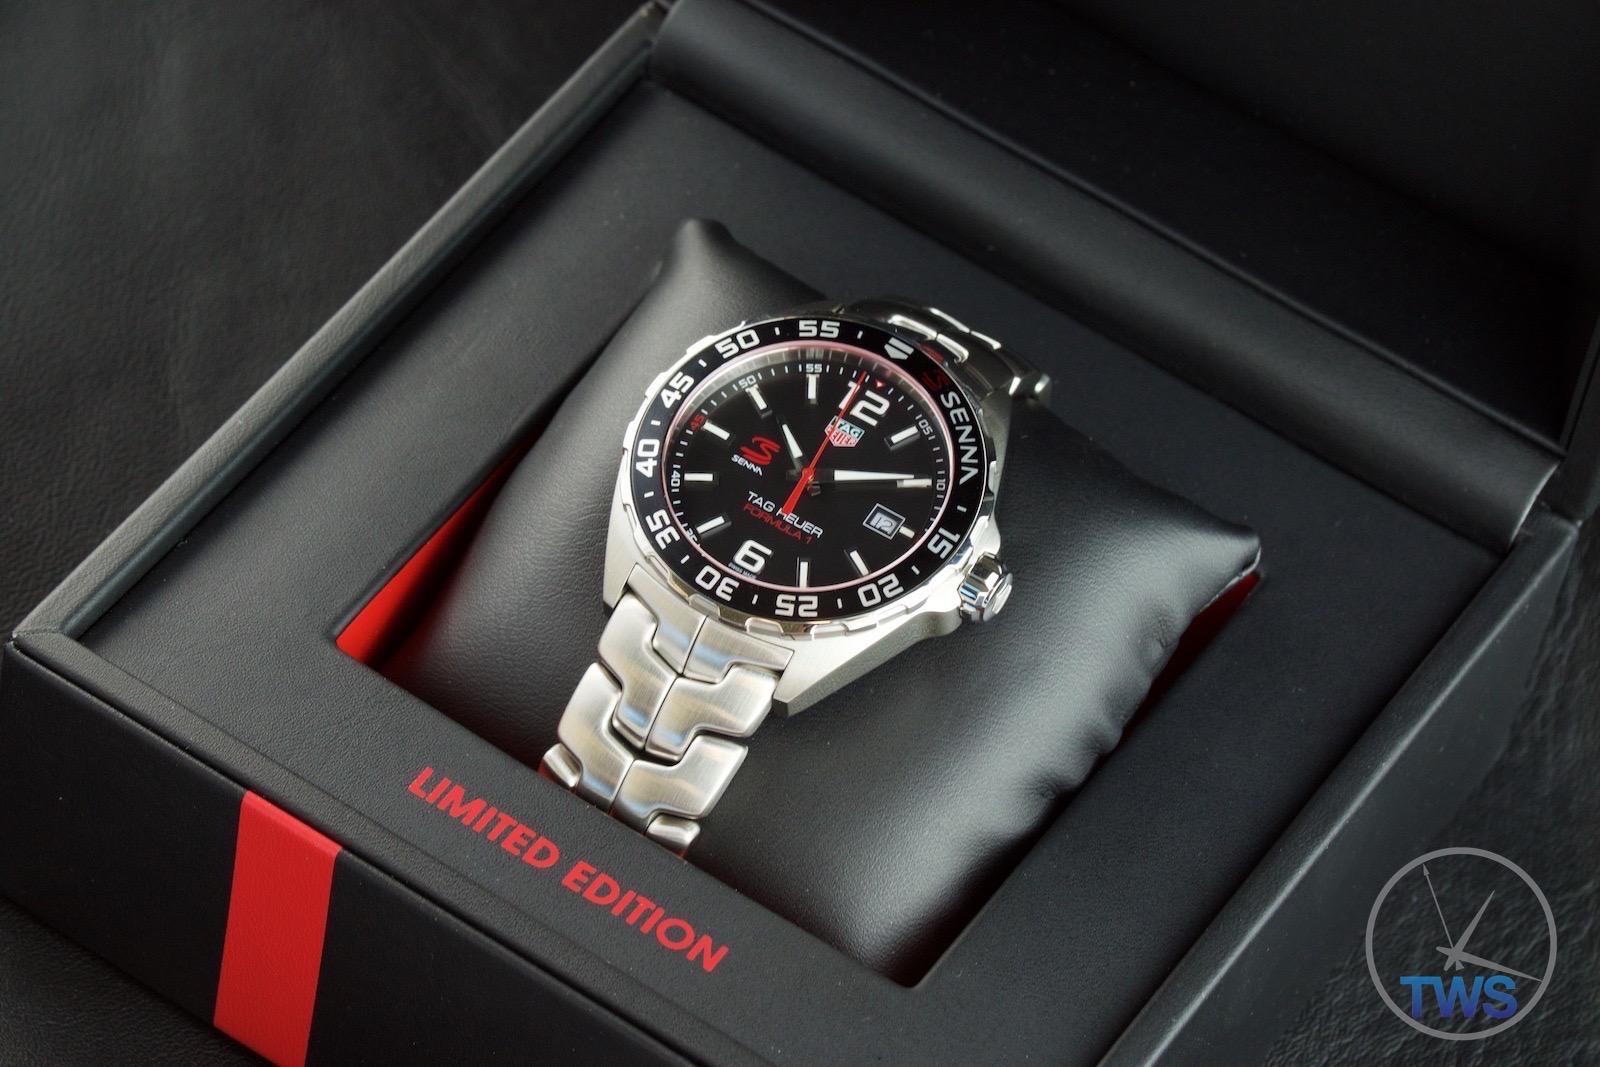 Tag Heuer Formula 1 Chronograph >> Tag Heuer Senna Special Edition Formula 1 Watch: Unboxing ...